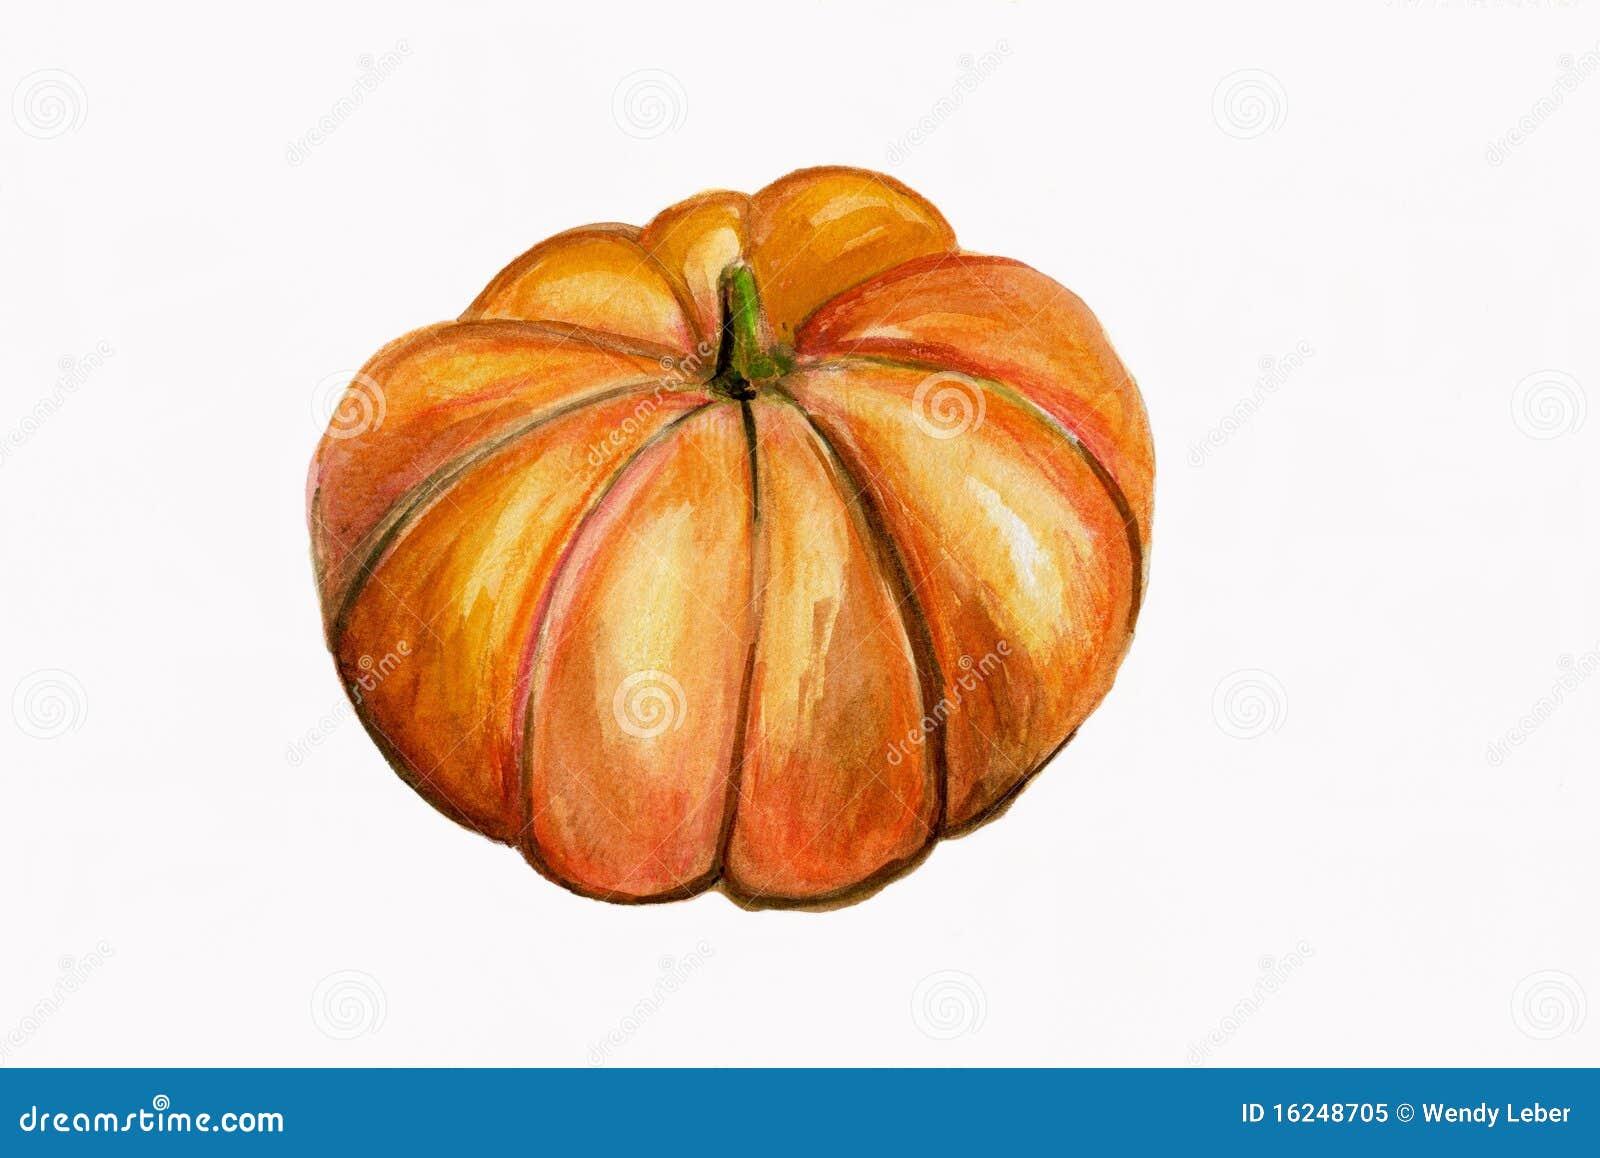 illustration single pumpkin royalty free stock photo